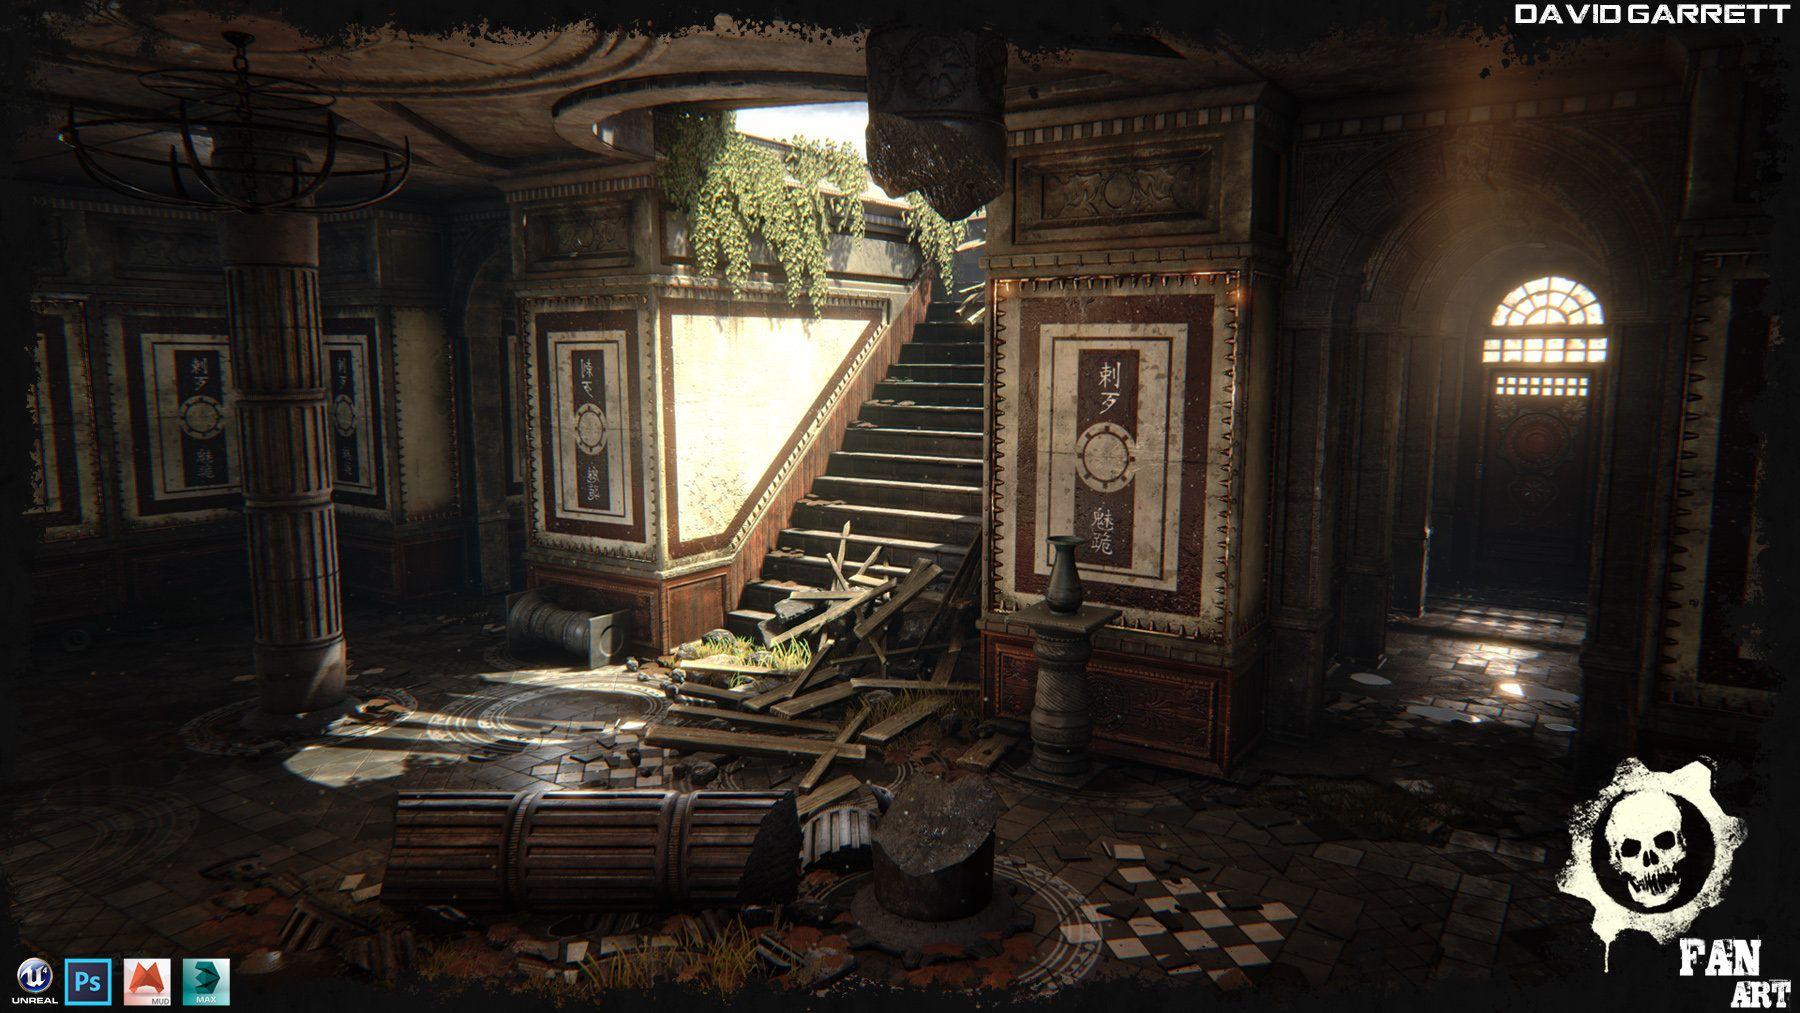 ArtStation - gears of war environment Unreal engine 4